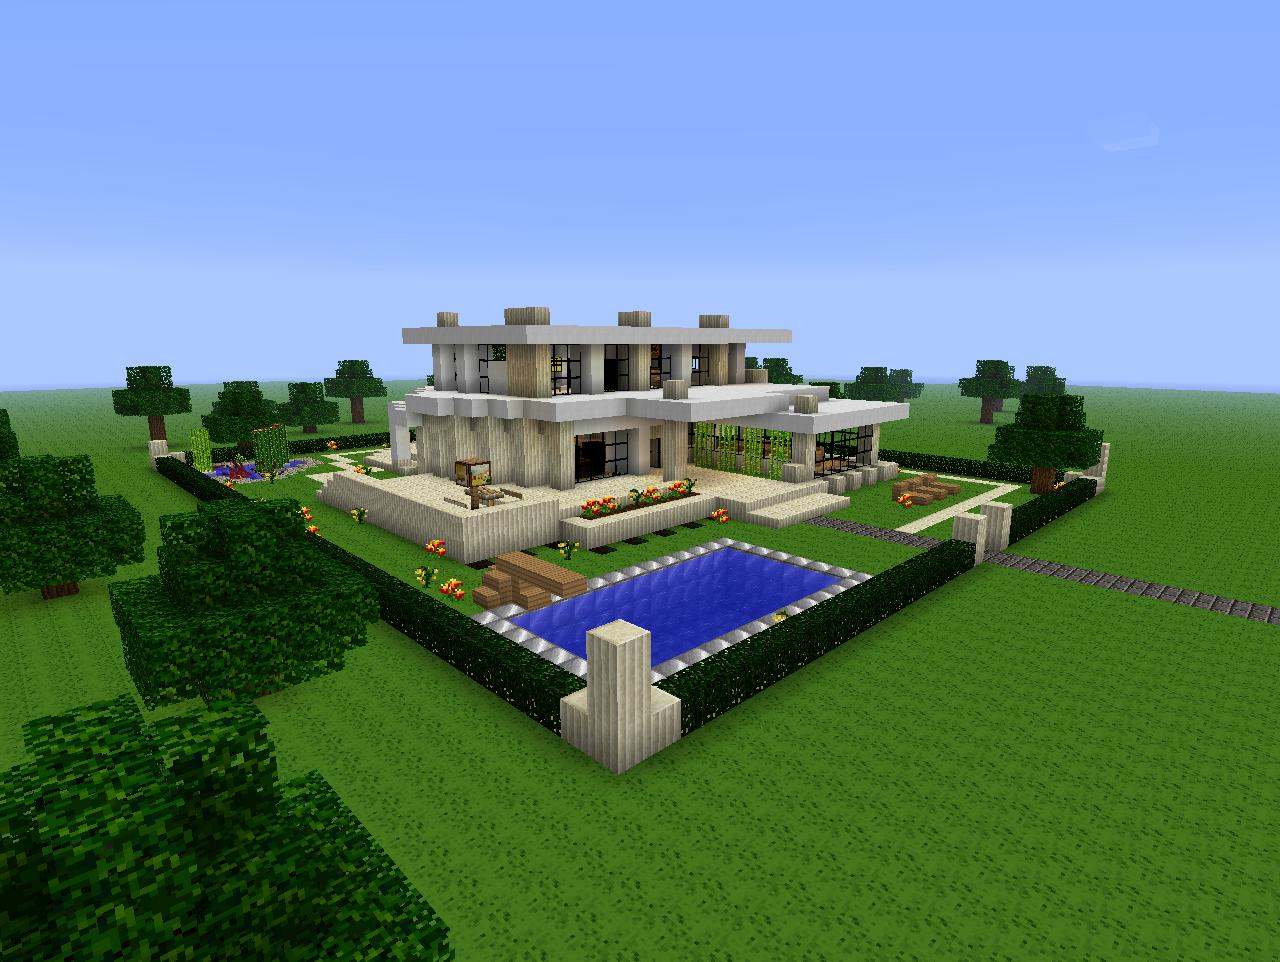 Minecraft Modern House 2 Beach Town Project 3 Minecraft Modern House 2